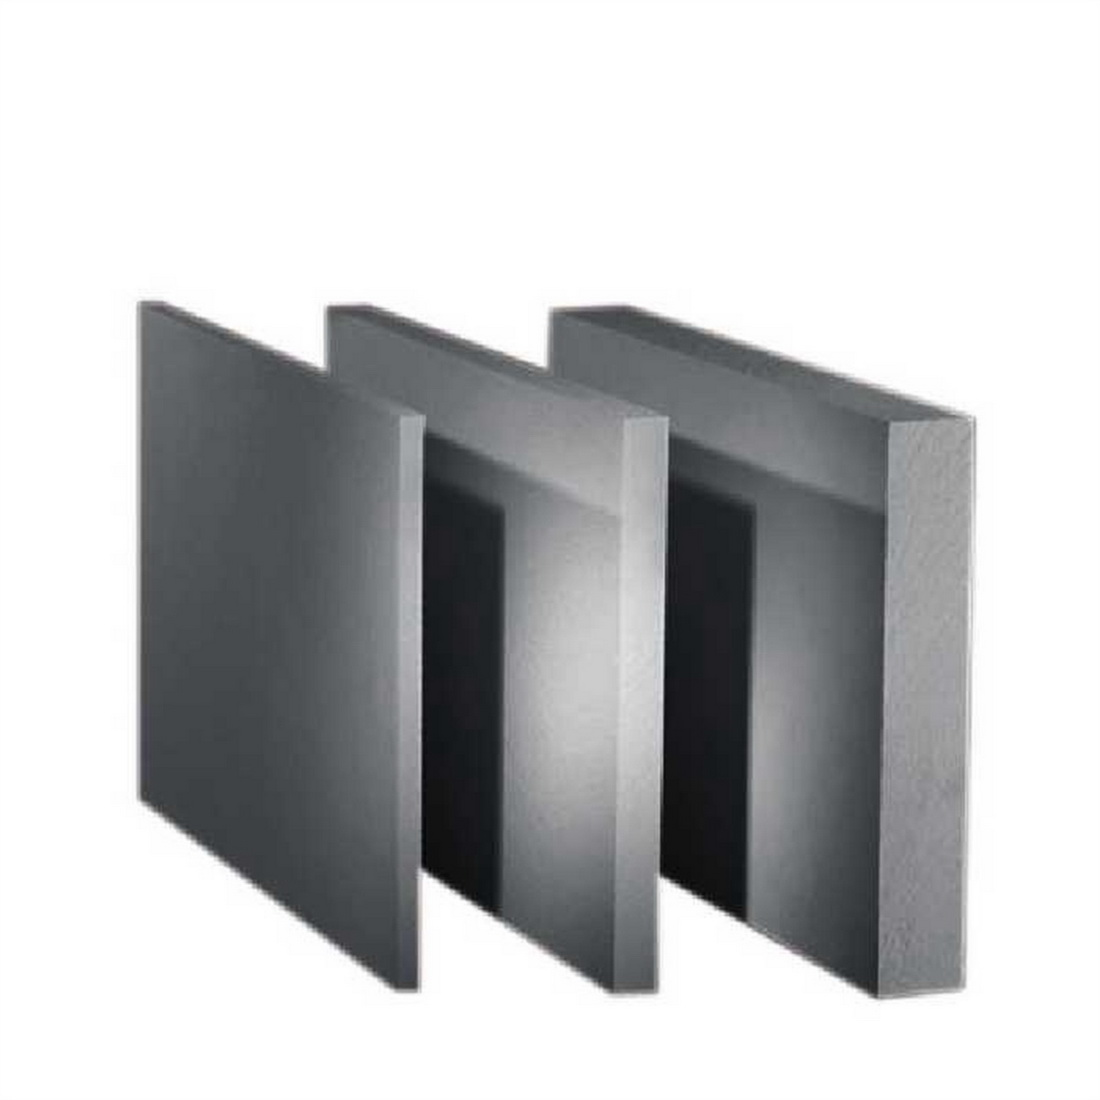 Expol Platinum Board 2400 x 1200 x 45mm R1.41 Black Expanded Polystyrene N2445